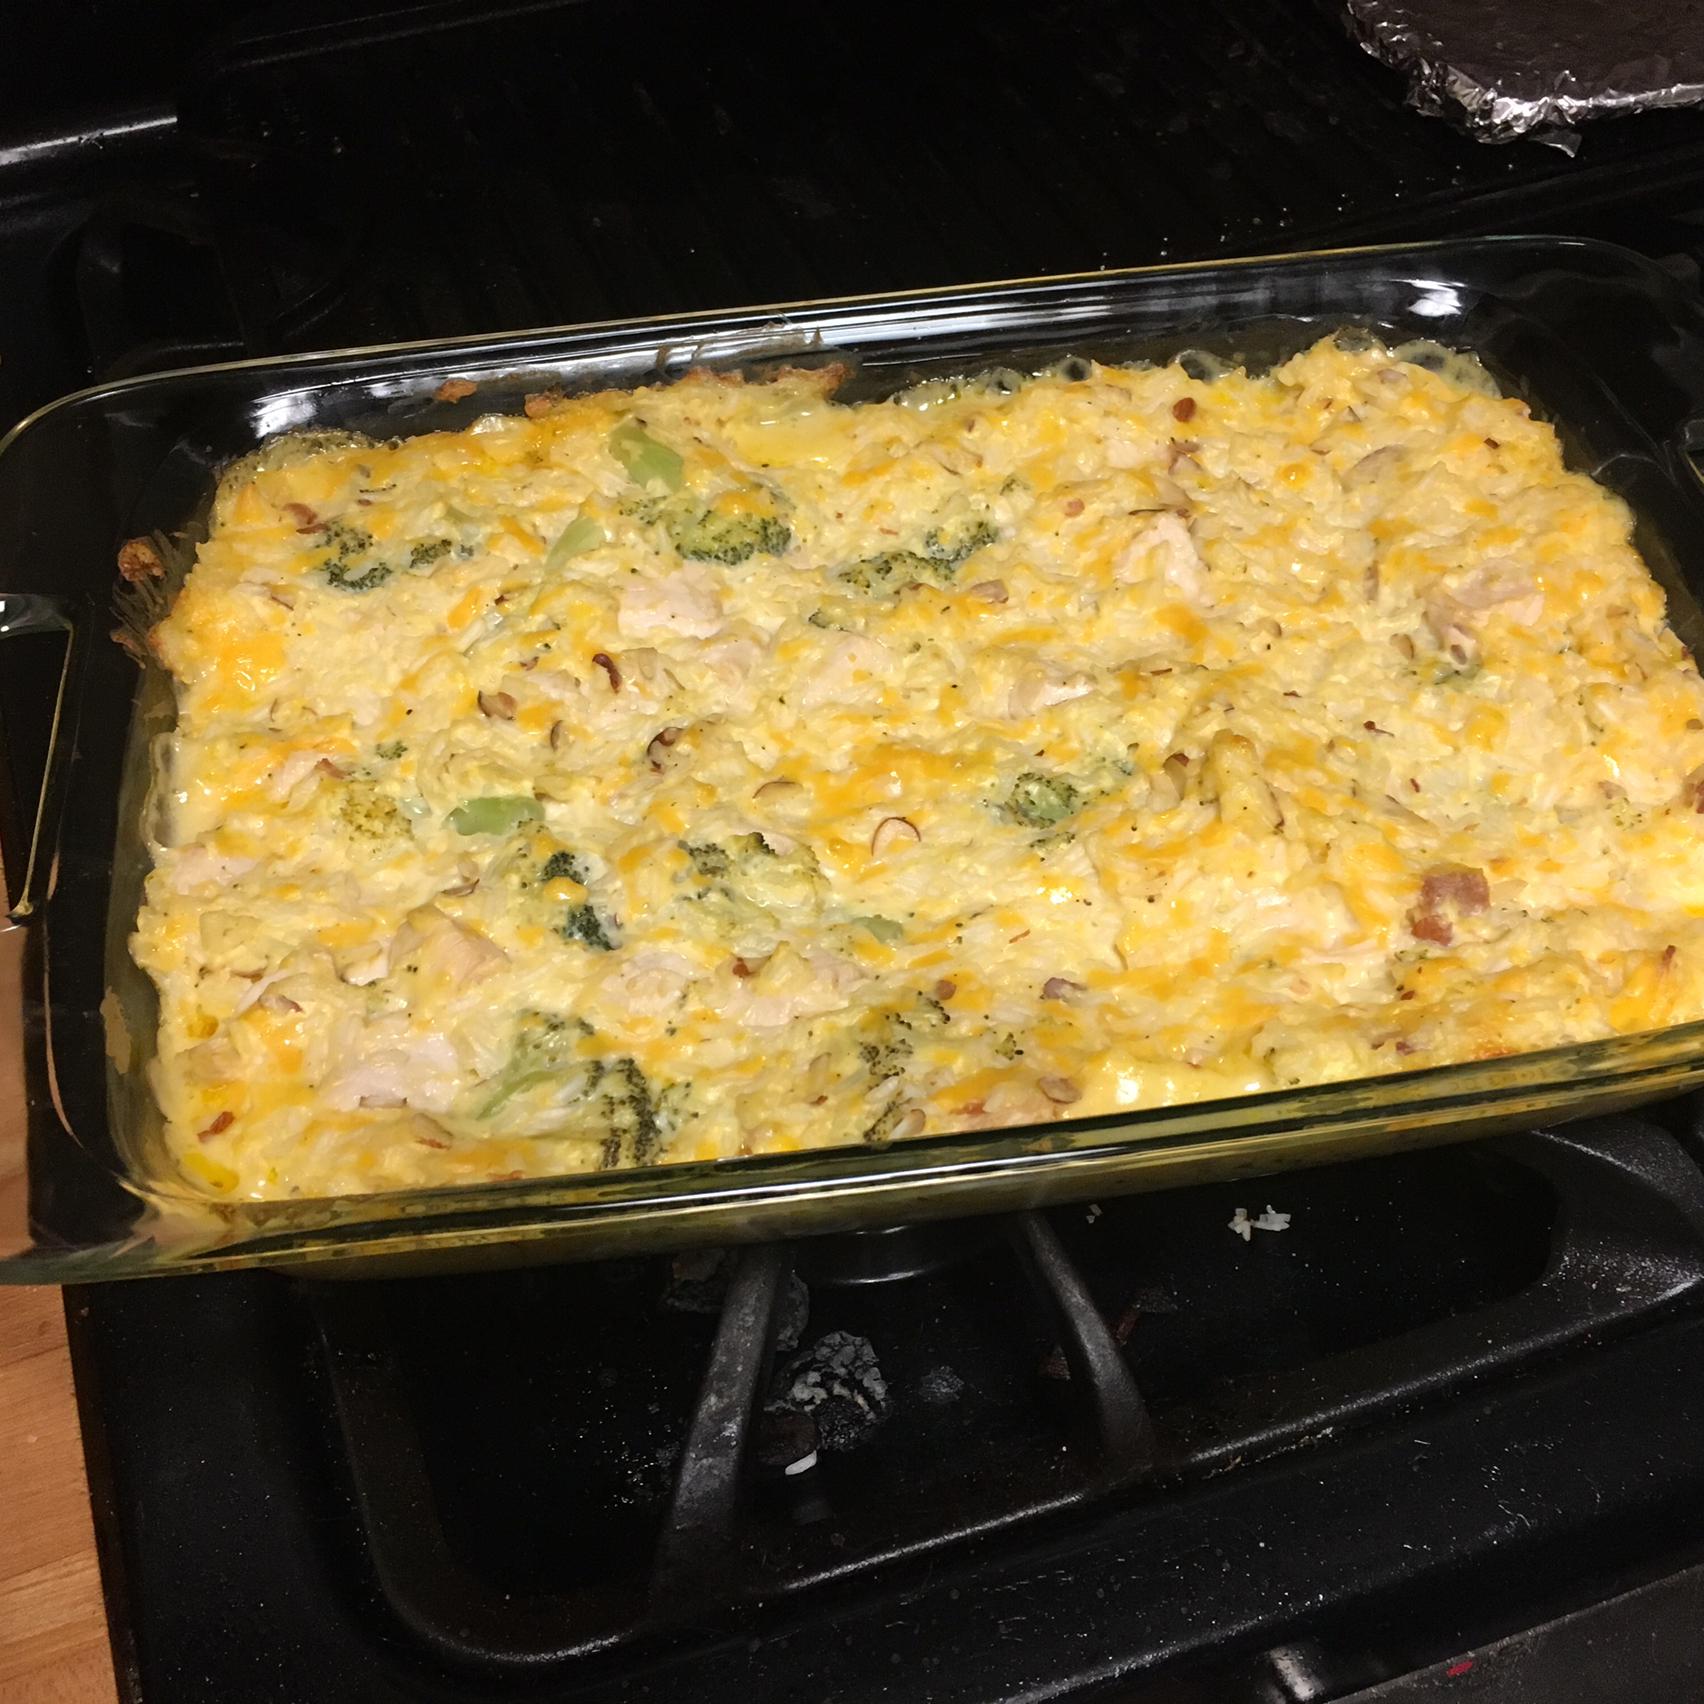 Easy Chicken and Broccoli Casserole Rachel Liptrap